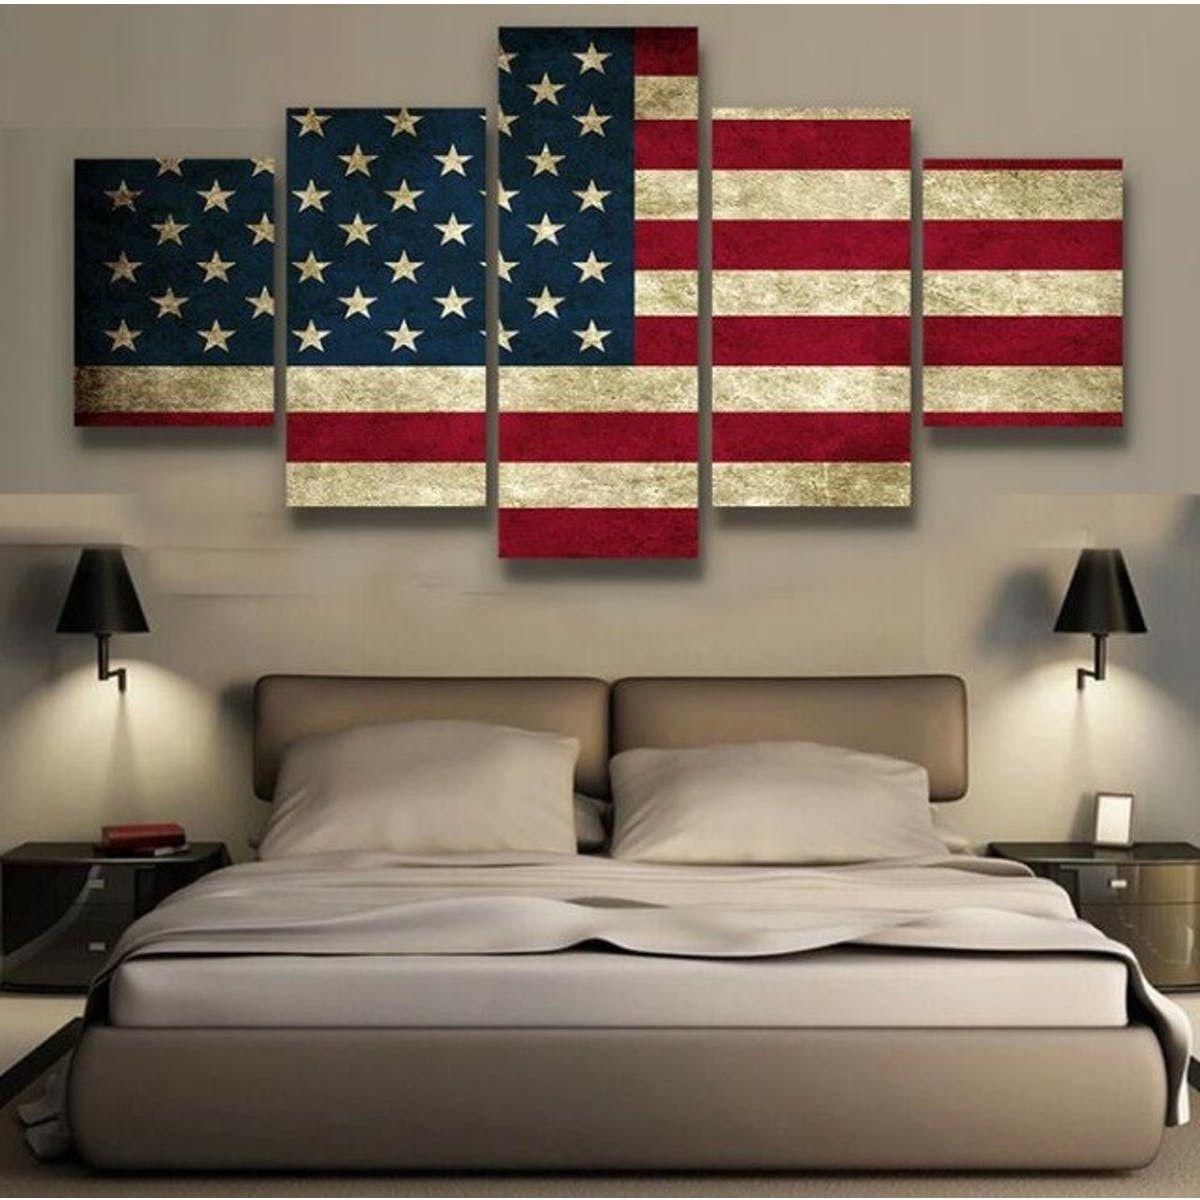 5 Panels Canvas Prints American Flag Wall Art American Flag Art Rustic American Flag